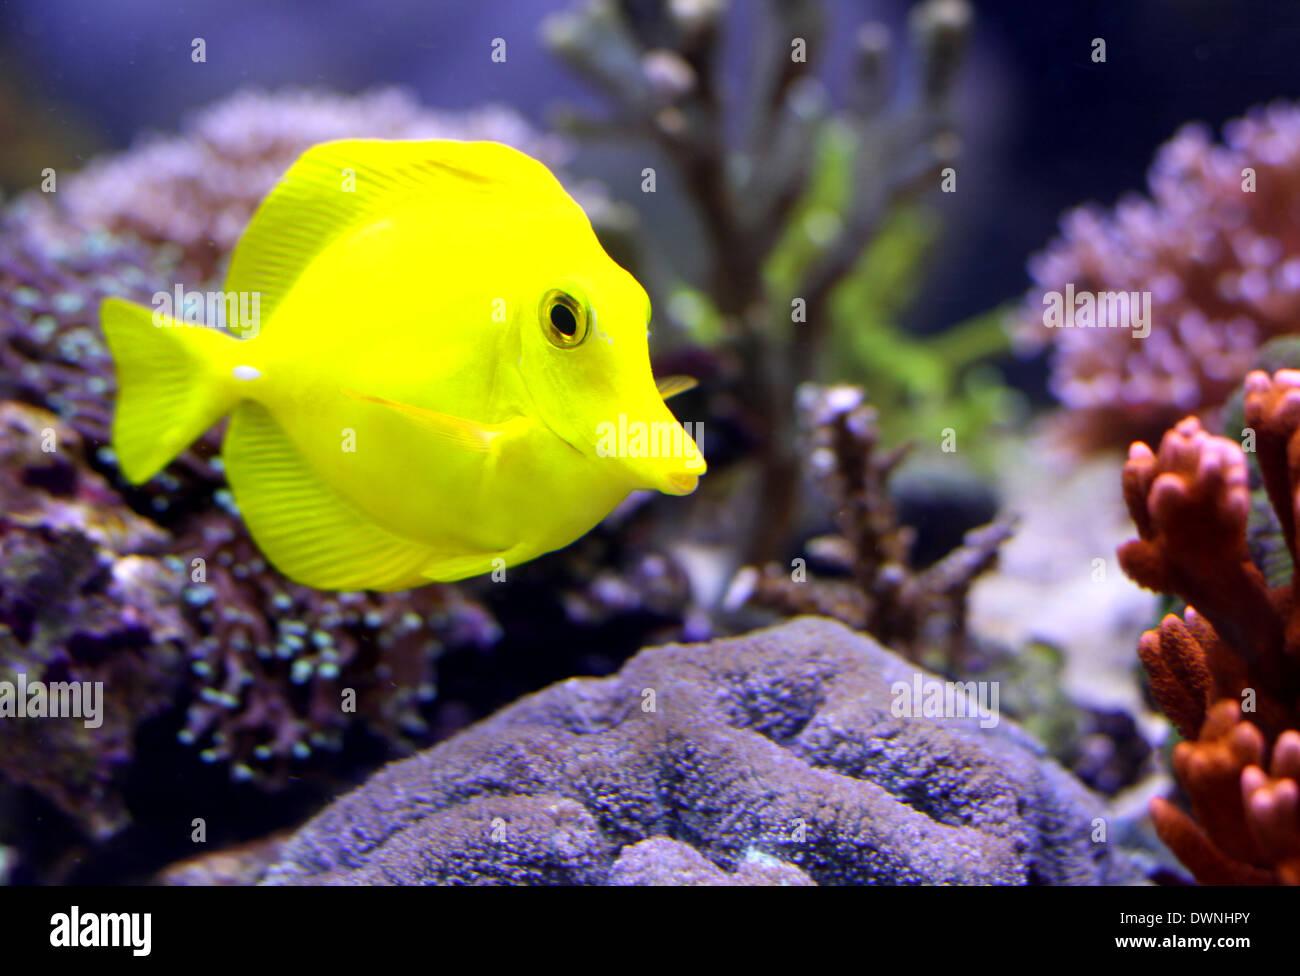 Yellow Tropical Fish That Swims In The Marine Aquarium